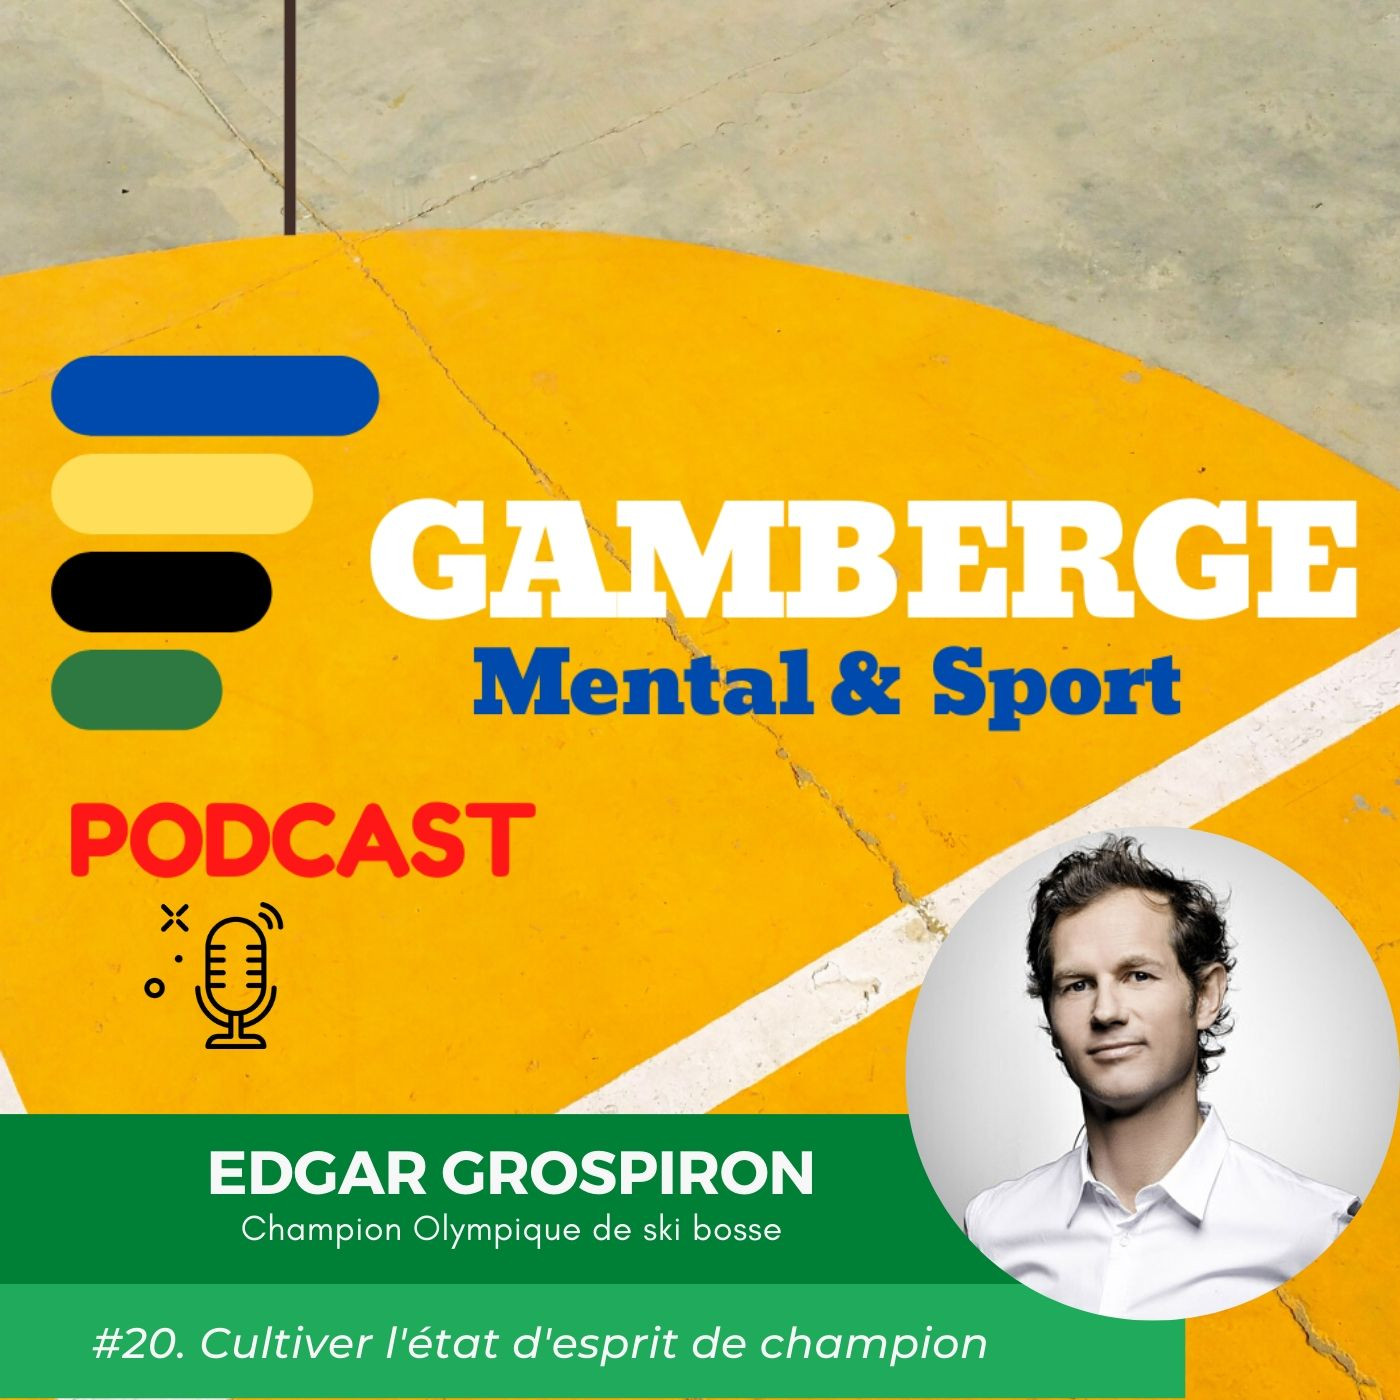 #20. Edgar Grospiron: Cultiver l'état d'esprit de champion